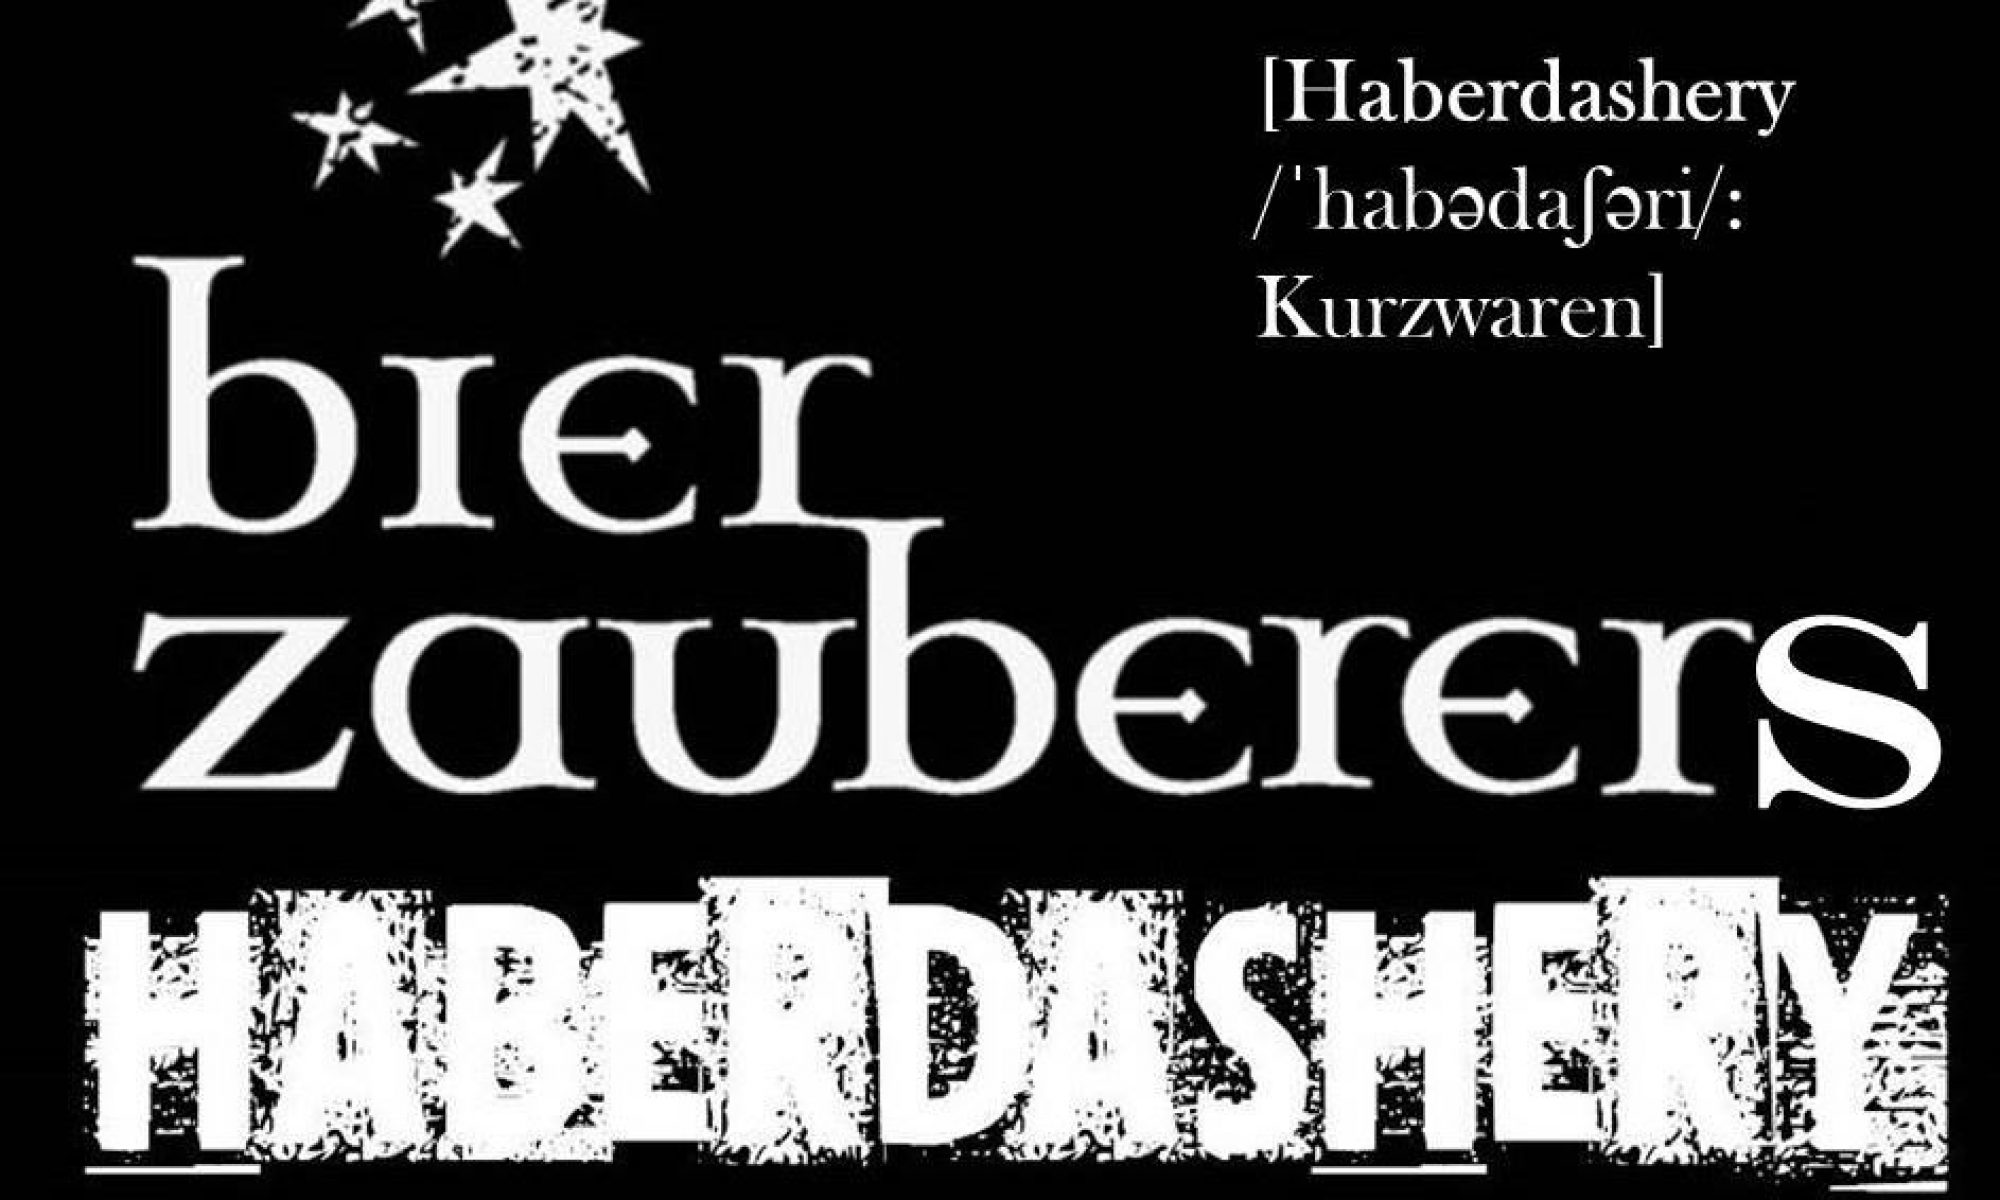 BIERZAUBERERS HABERDASHERY